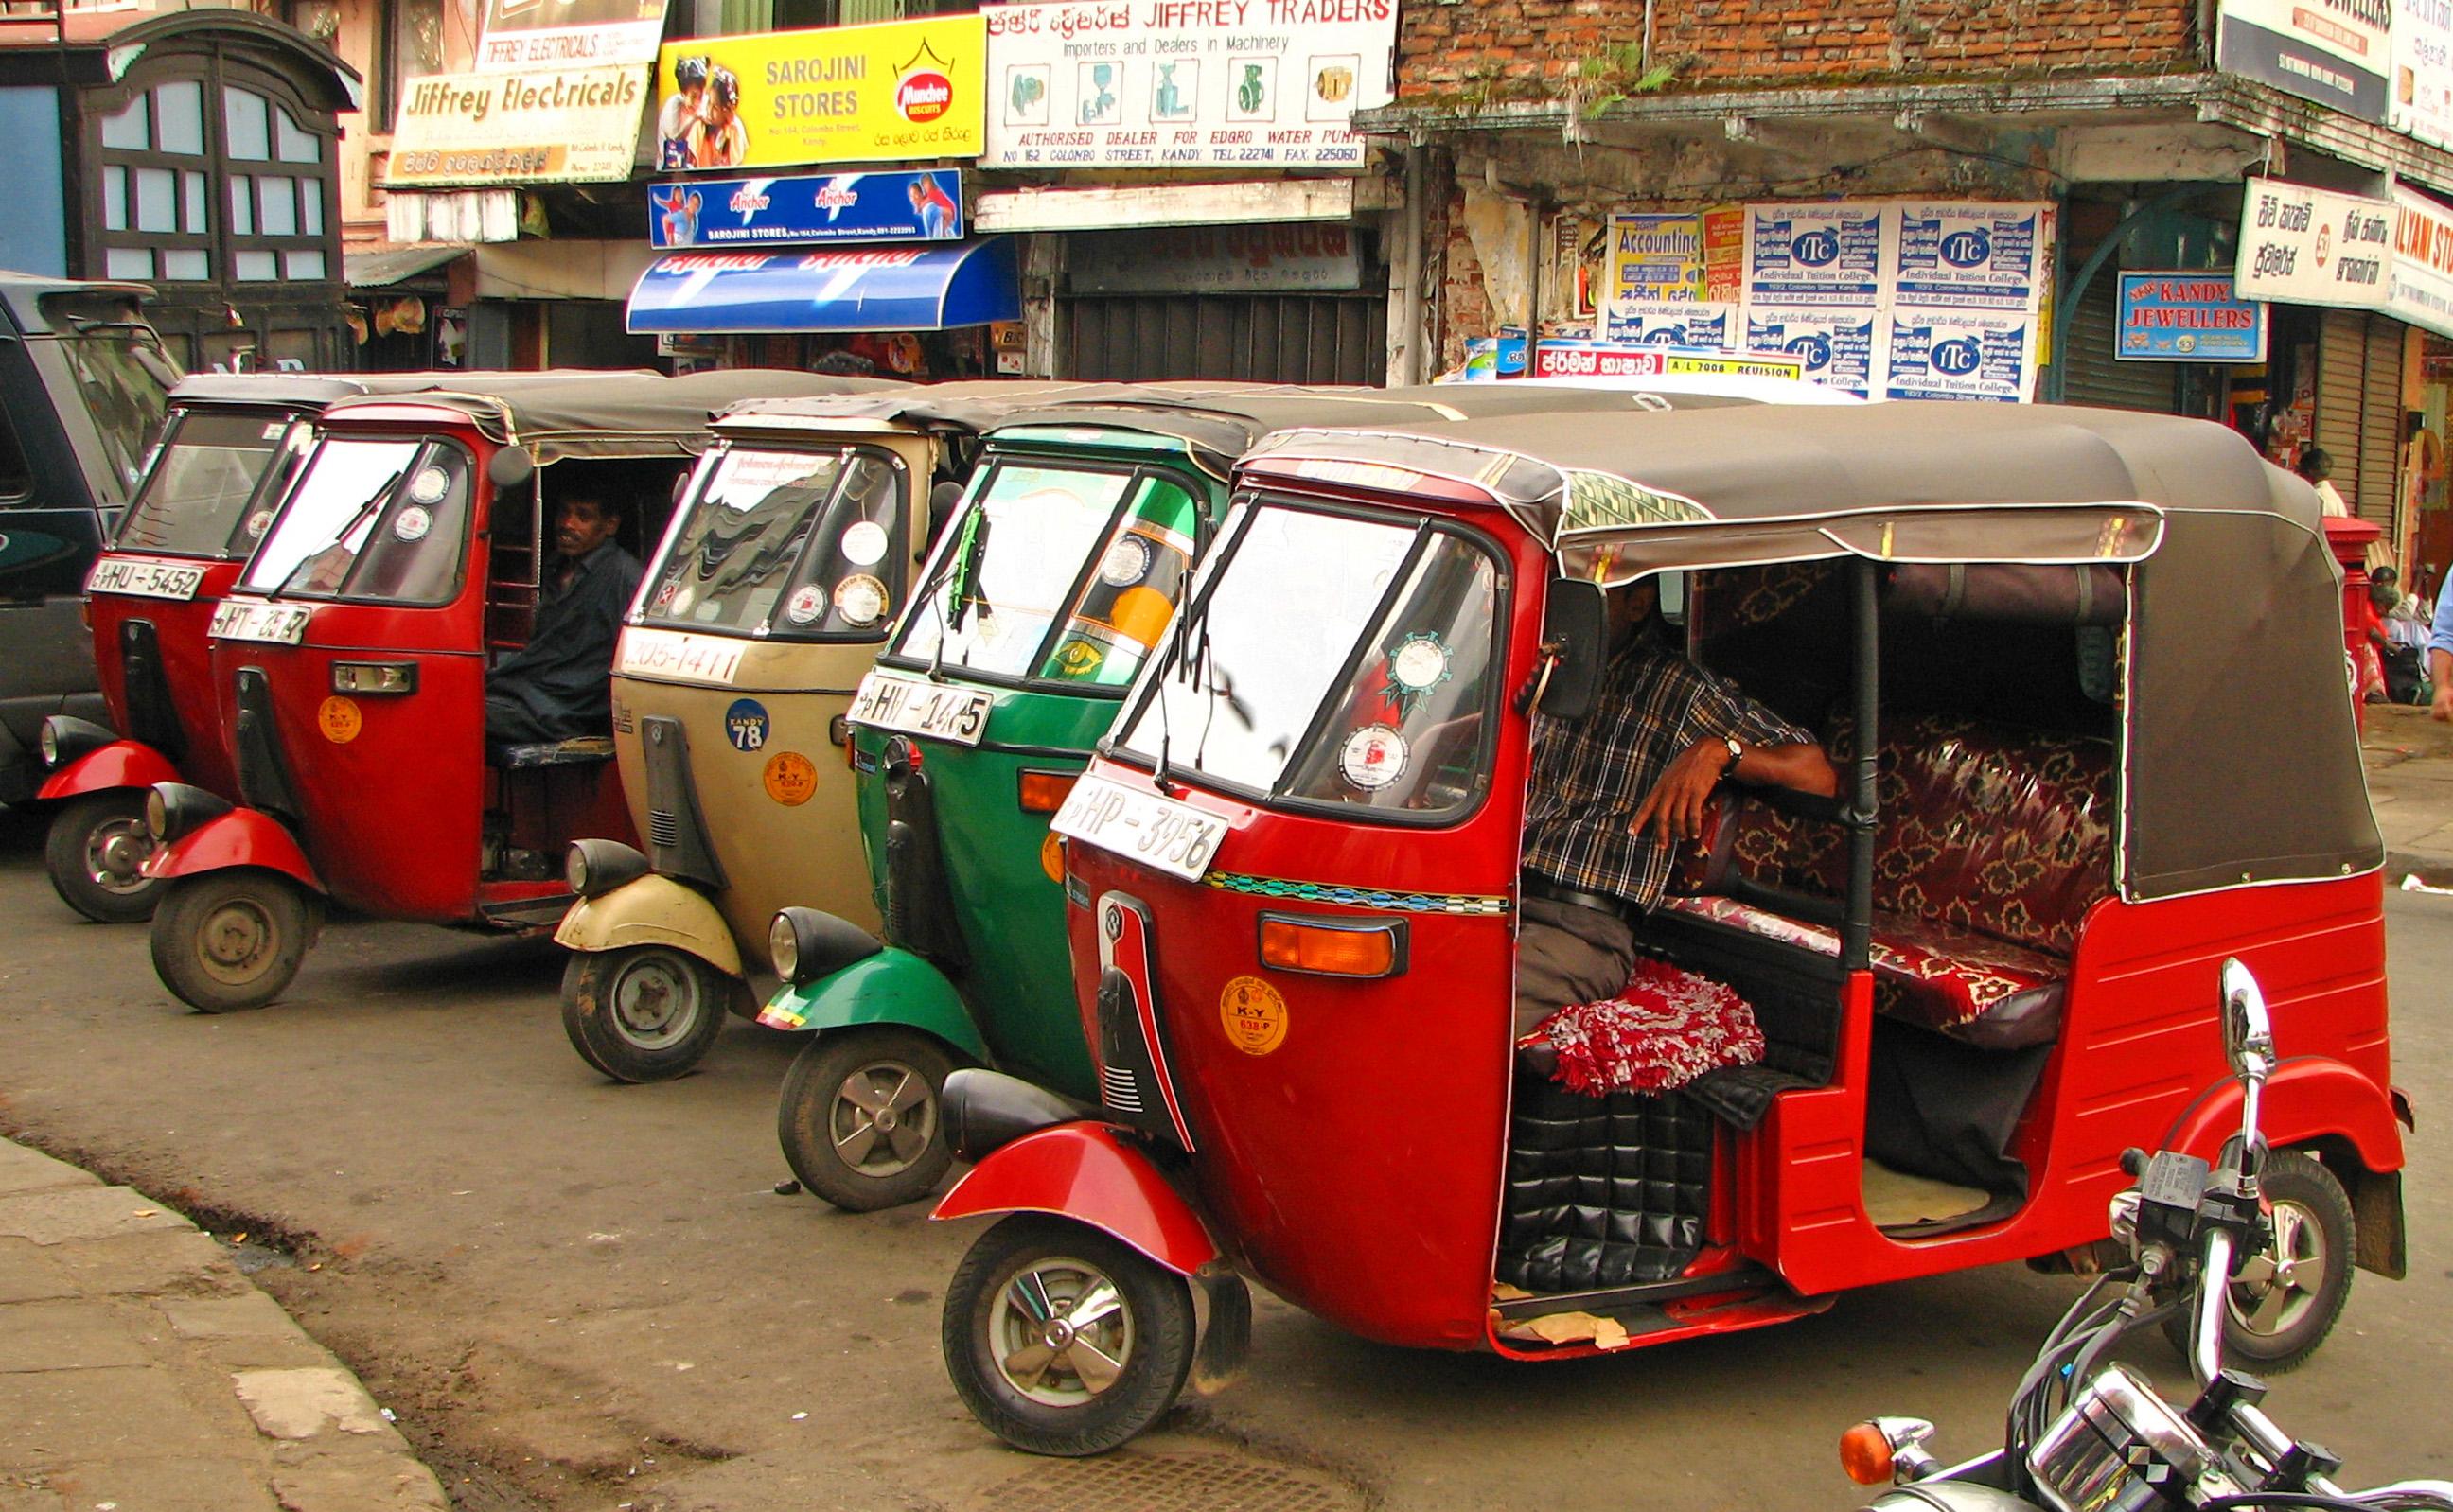 Tuk-tuk yang berwarna-warni di Kandy, Sri Lanka. Tidak seperti di India dan Thailand, tuk-tuk di sini memiliki berbagai warna seperti permen termasuk biru dan merah muda. Semua warna ini telah menyemarakkan jalan-jalan di Sri Lanka. Flickr - McKay Savage.